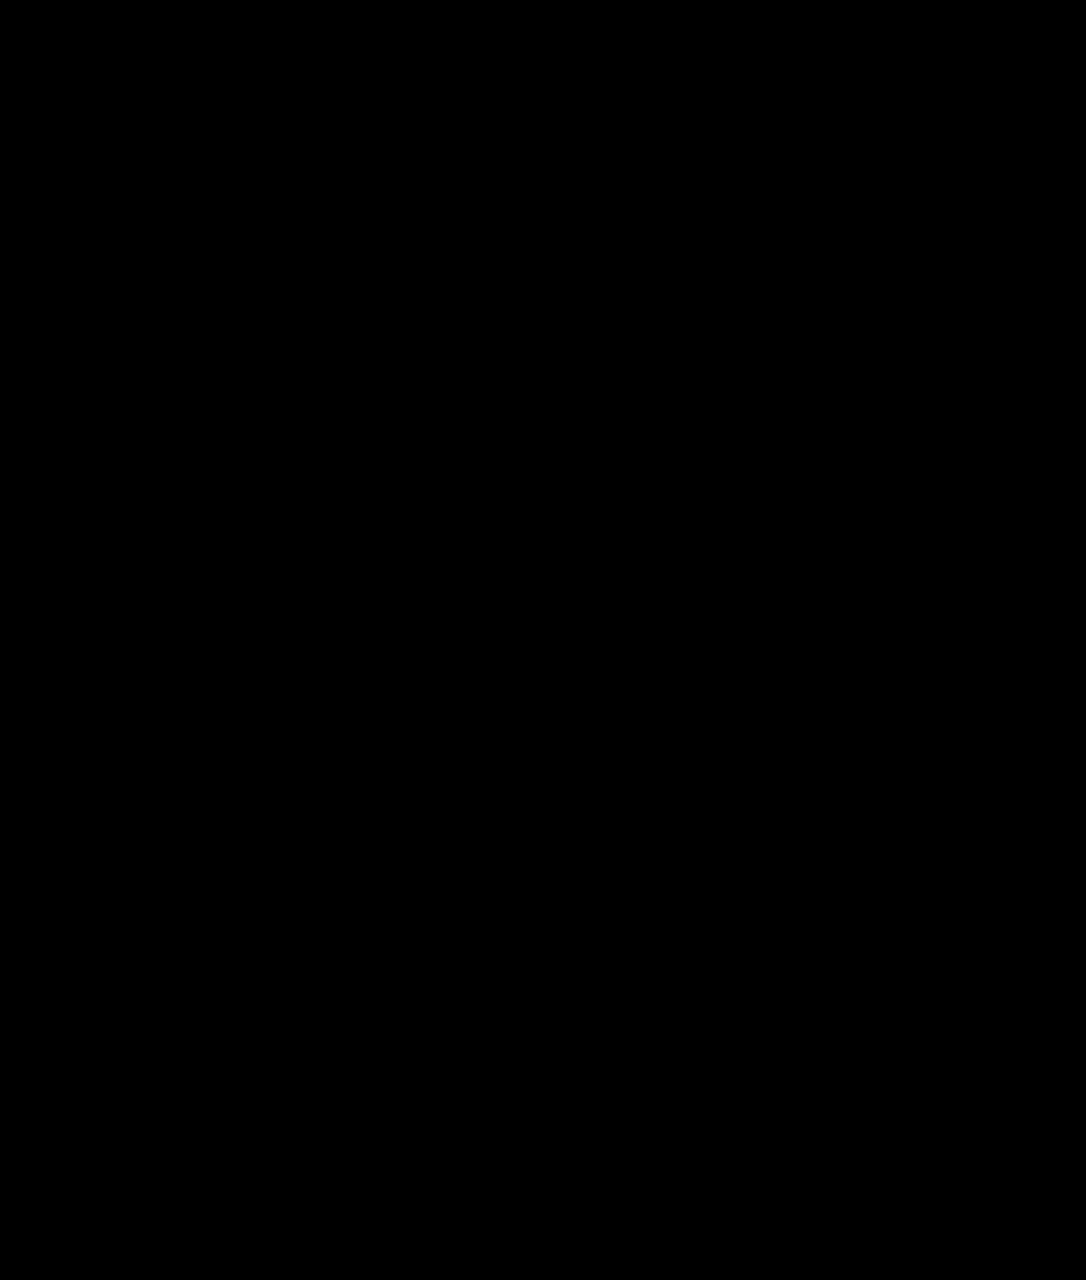 Poltrona Preta 60x70x67 cm